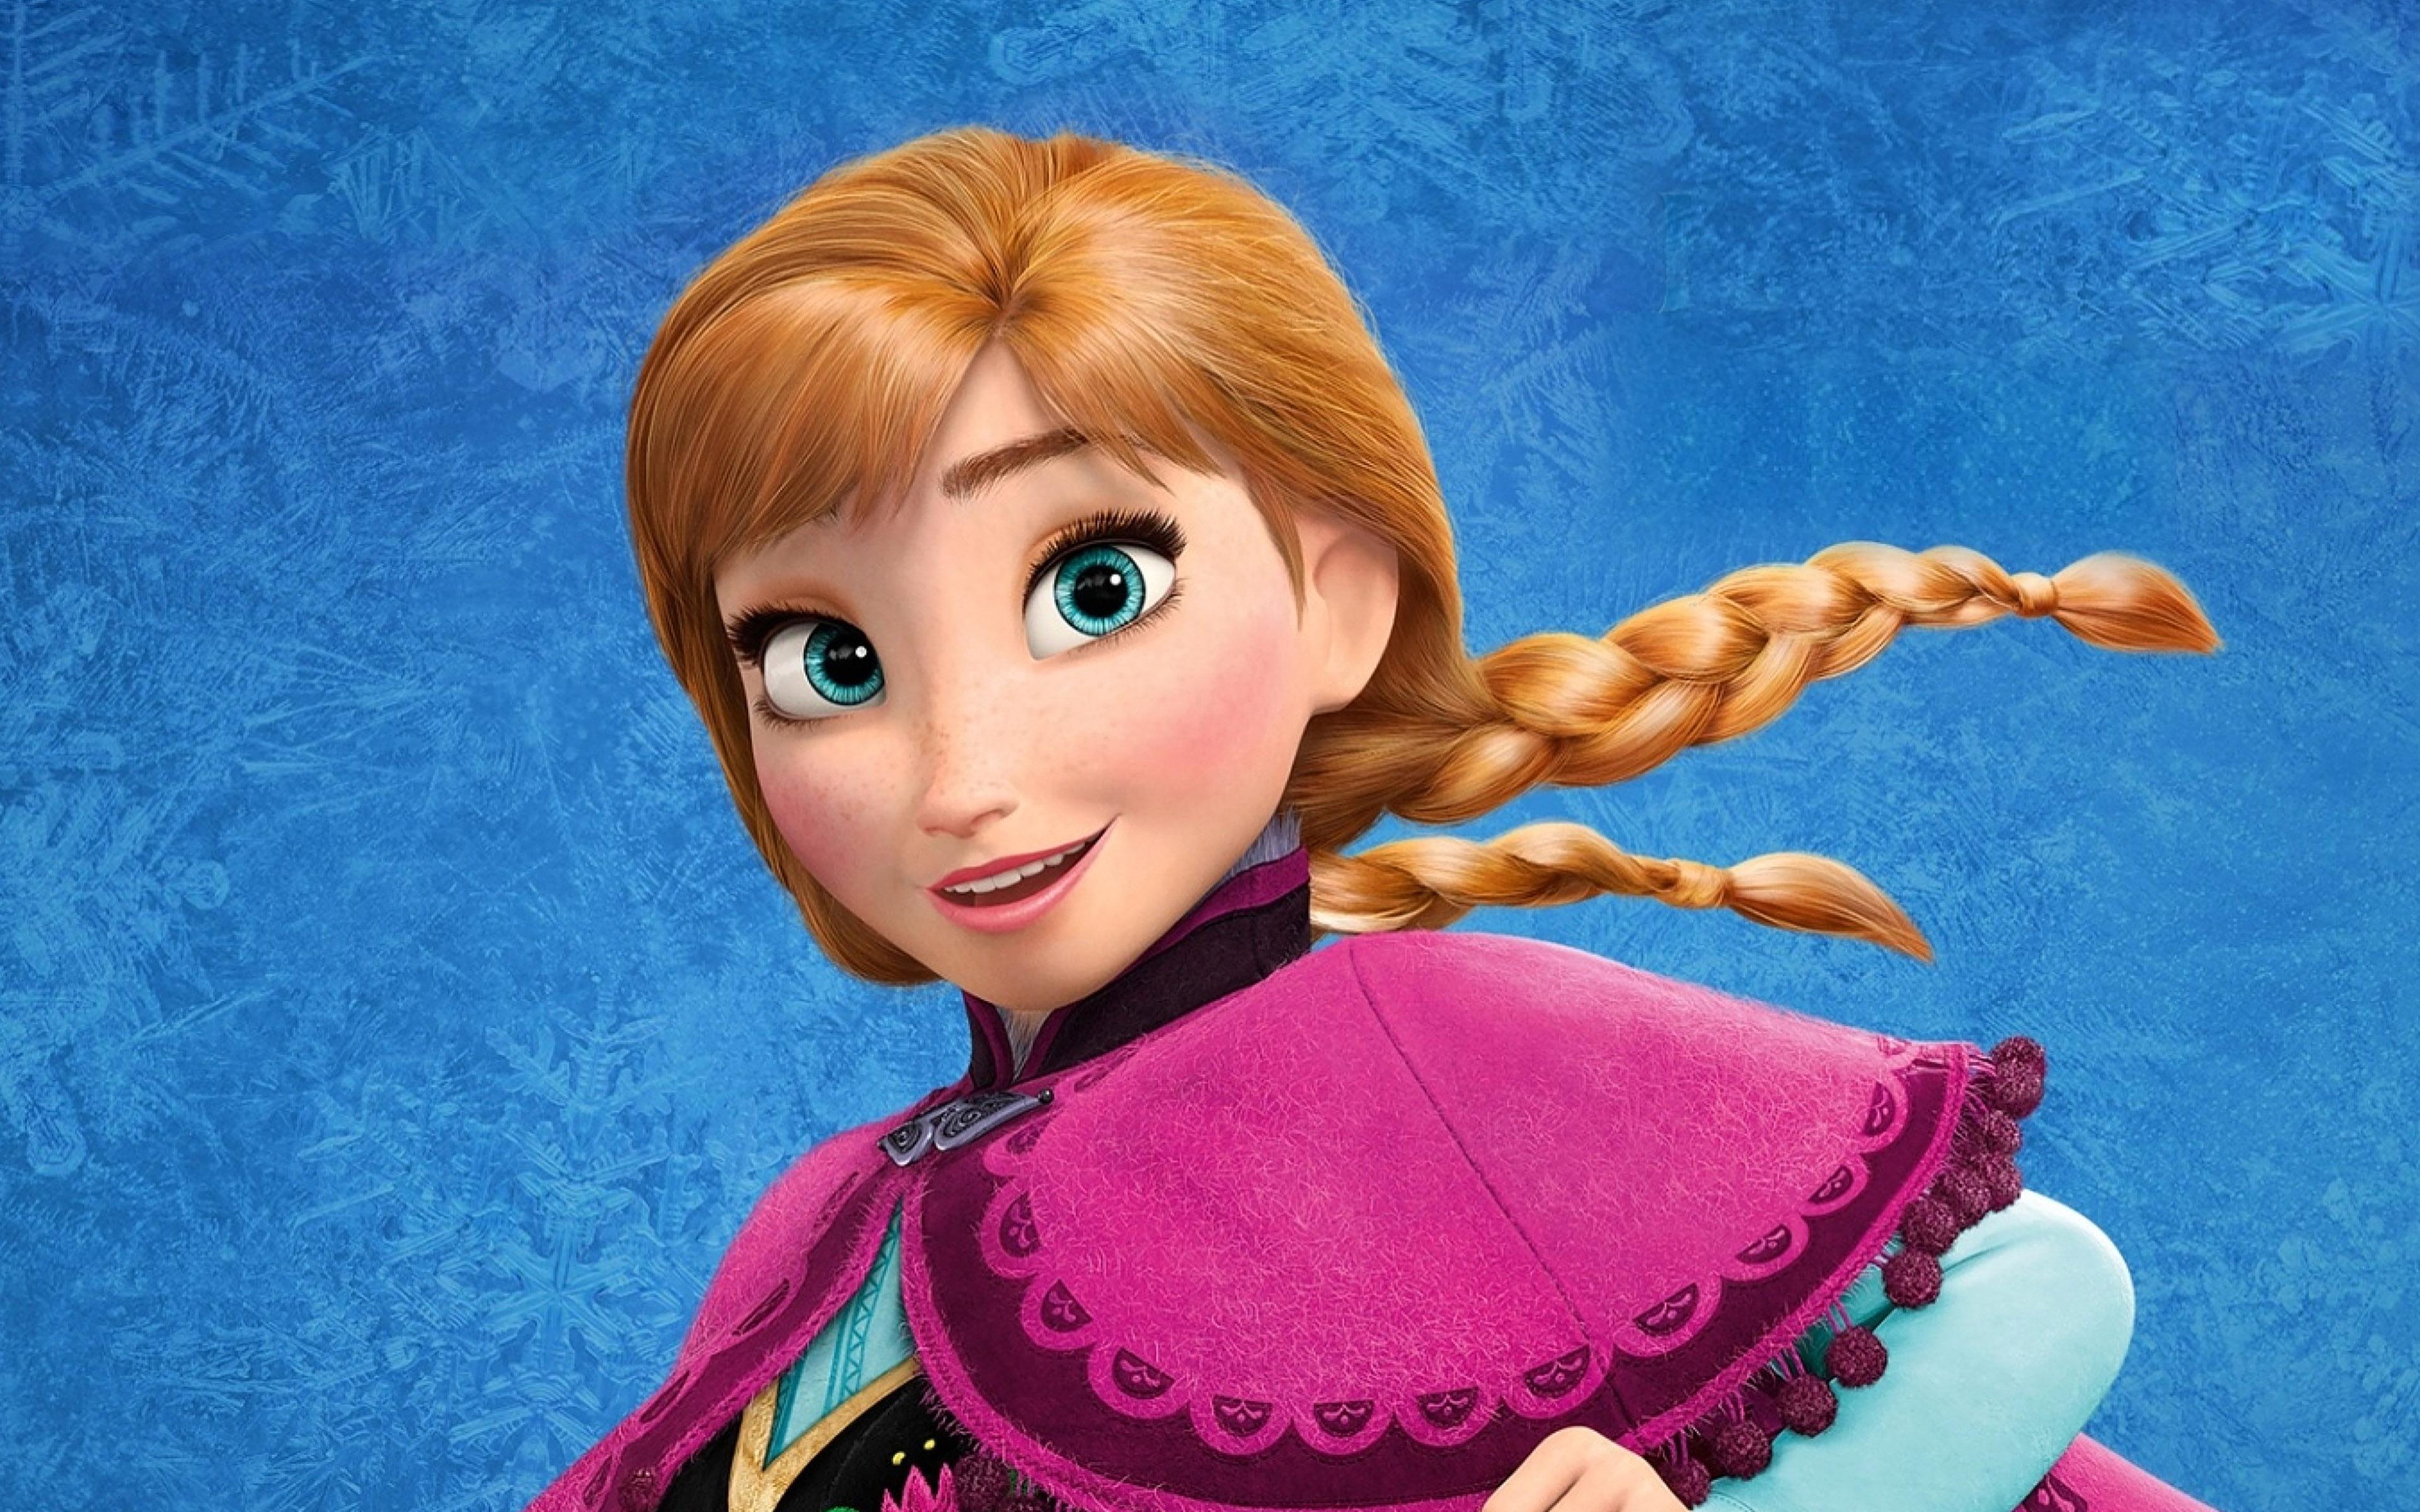 Ae50 Frozen Disney Princess Anna Of Arendelle Illust